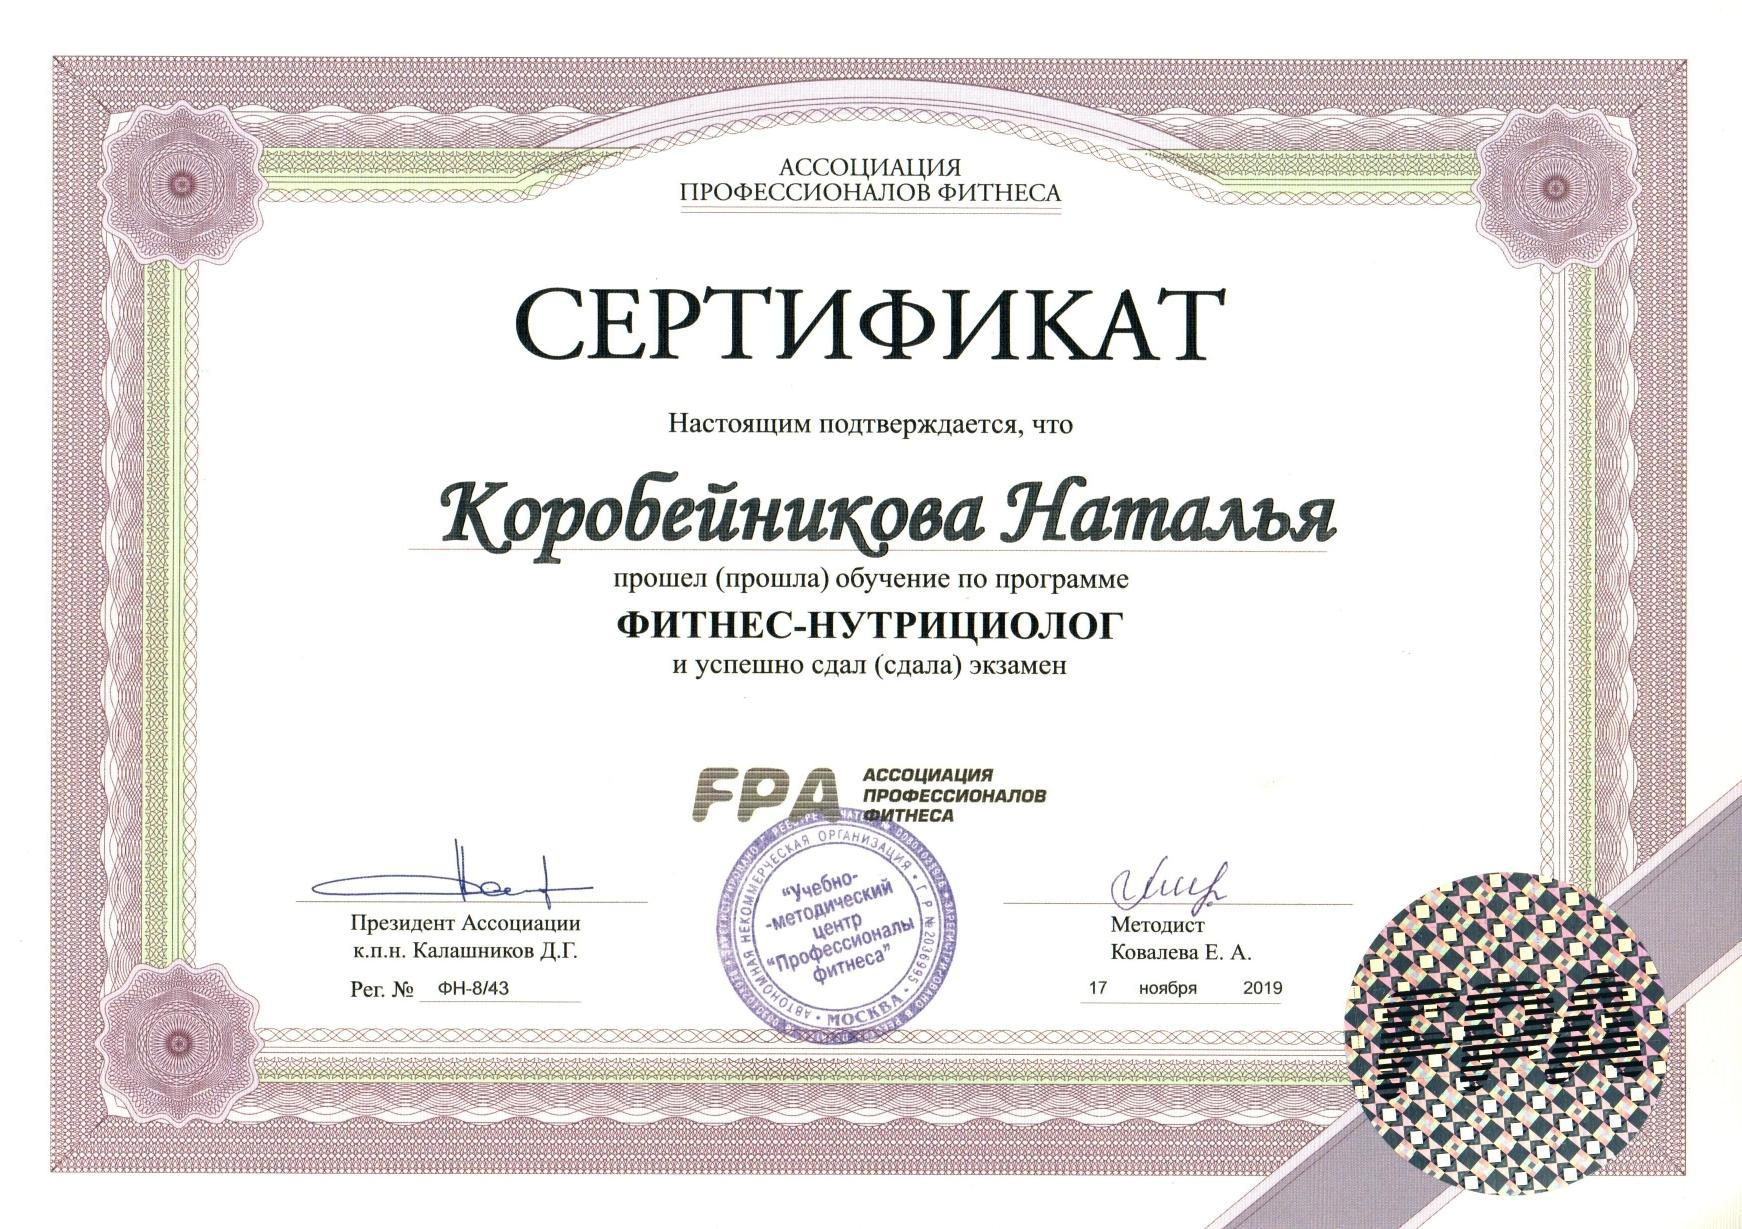 Таша Коробейникова — сертифицированный нутрициолог, эксперт журнала COLADY